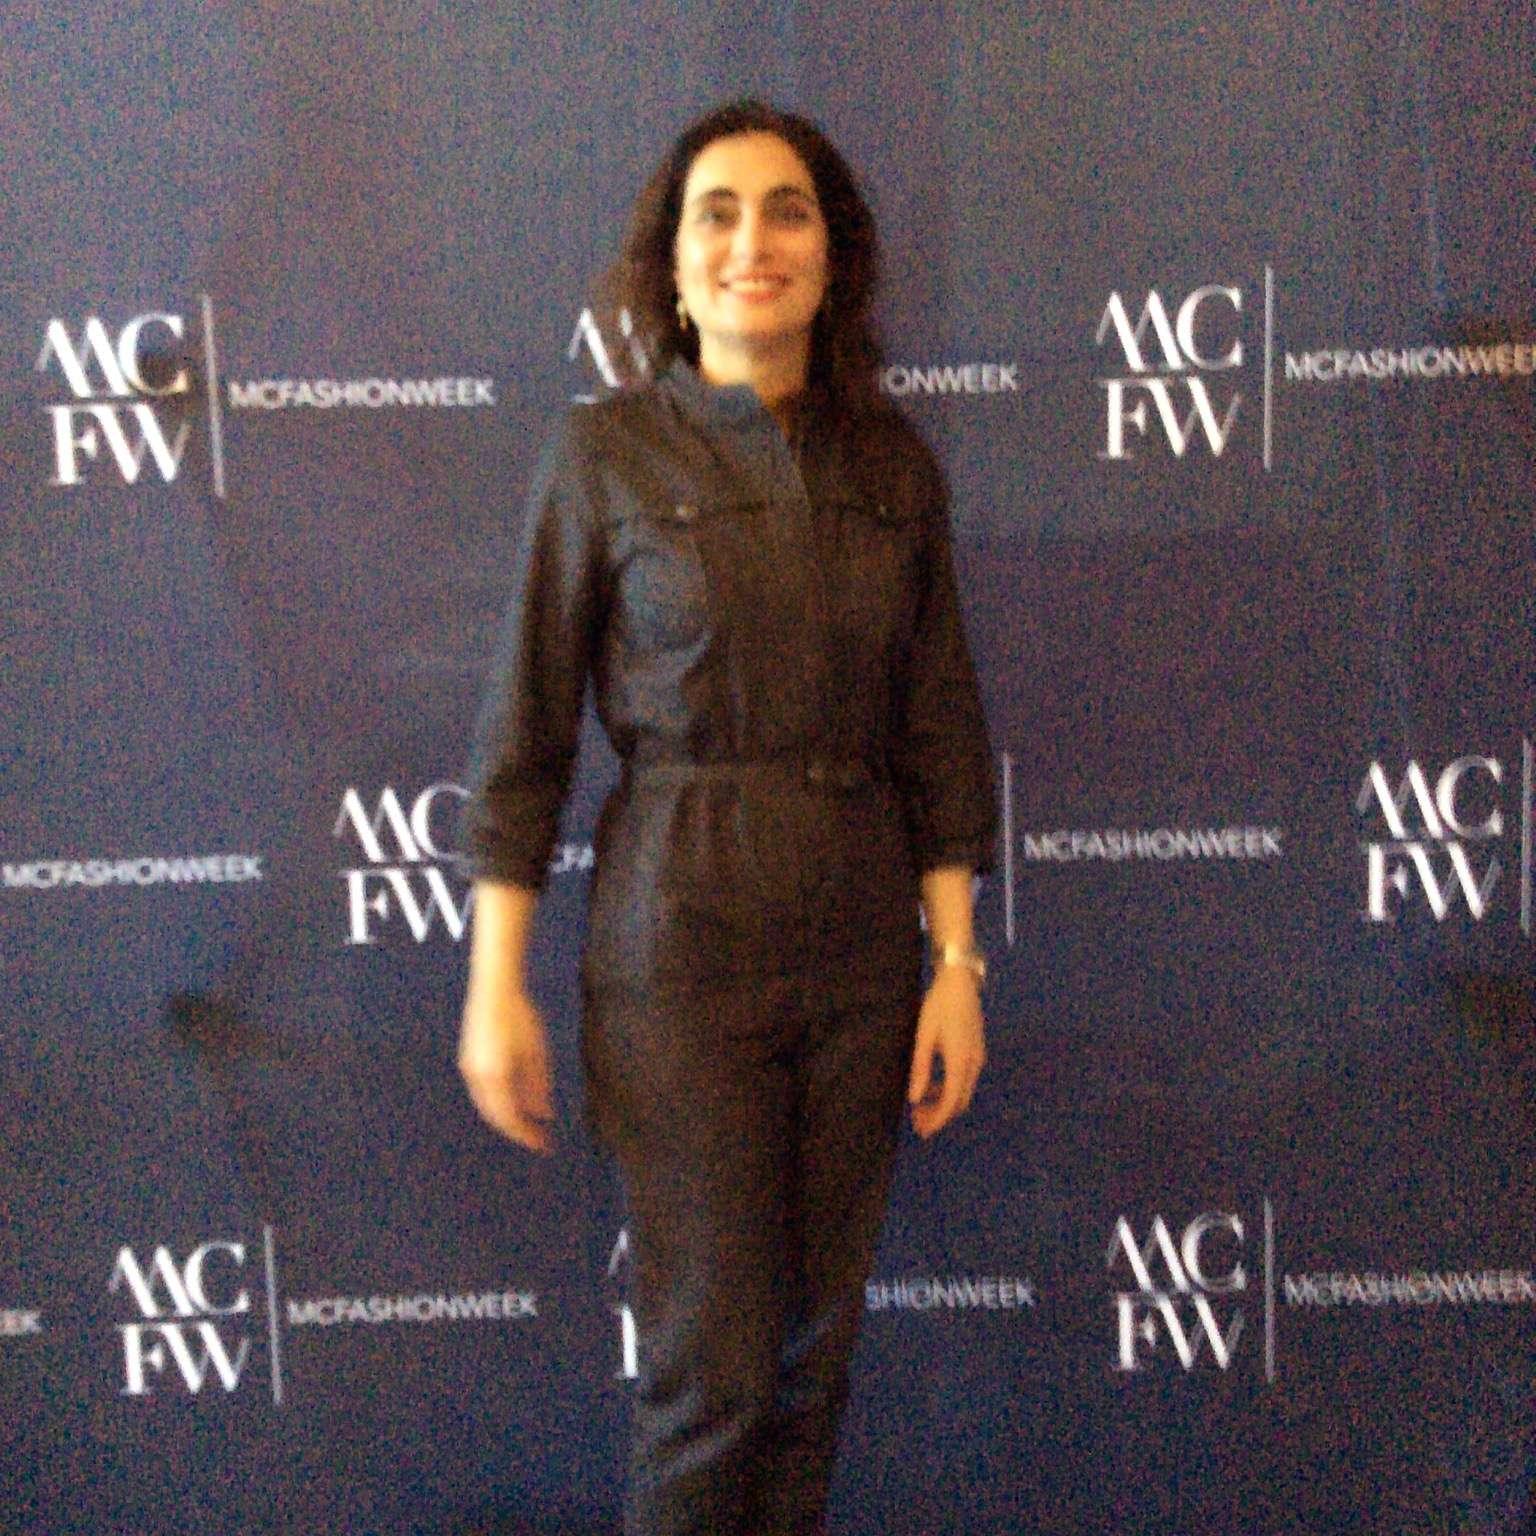 MonteCarlo Fashion Week, Chambre Monégasque de la Mode, Crefovi, Annabelle Gauberti